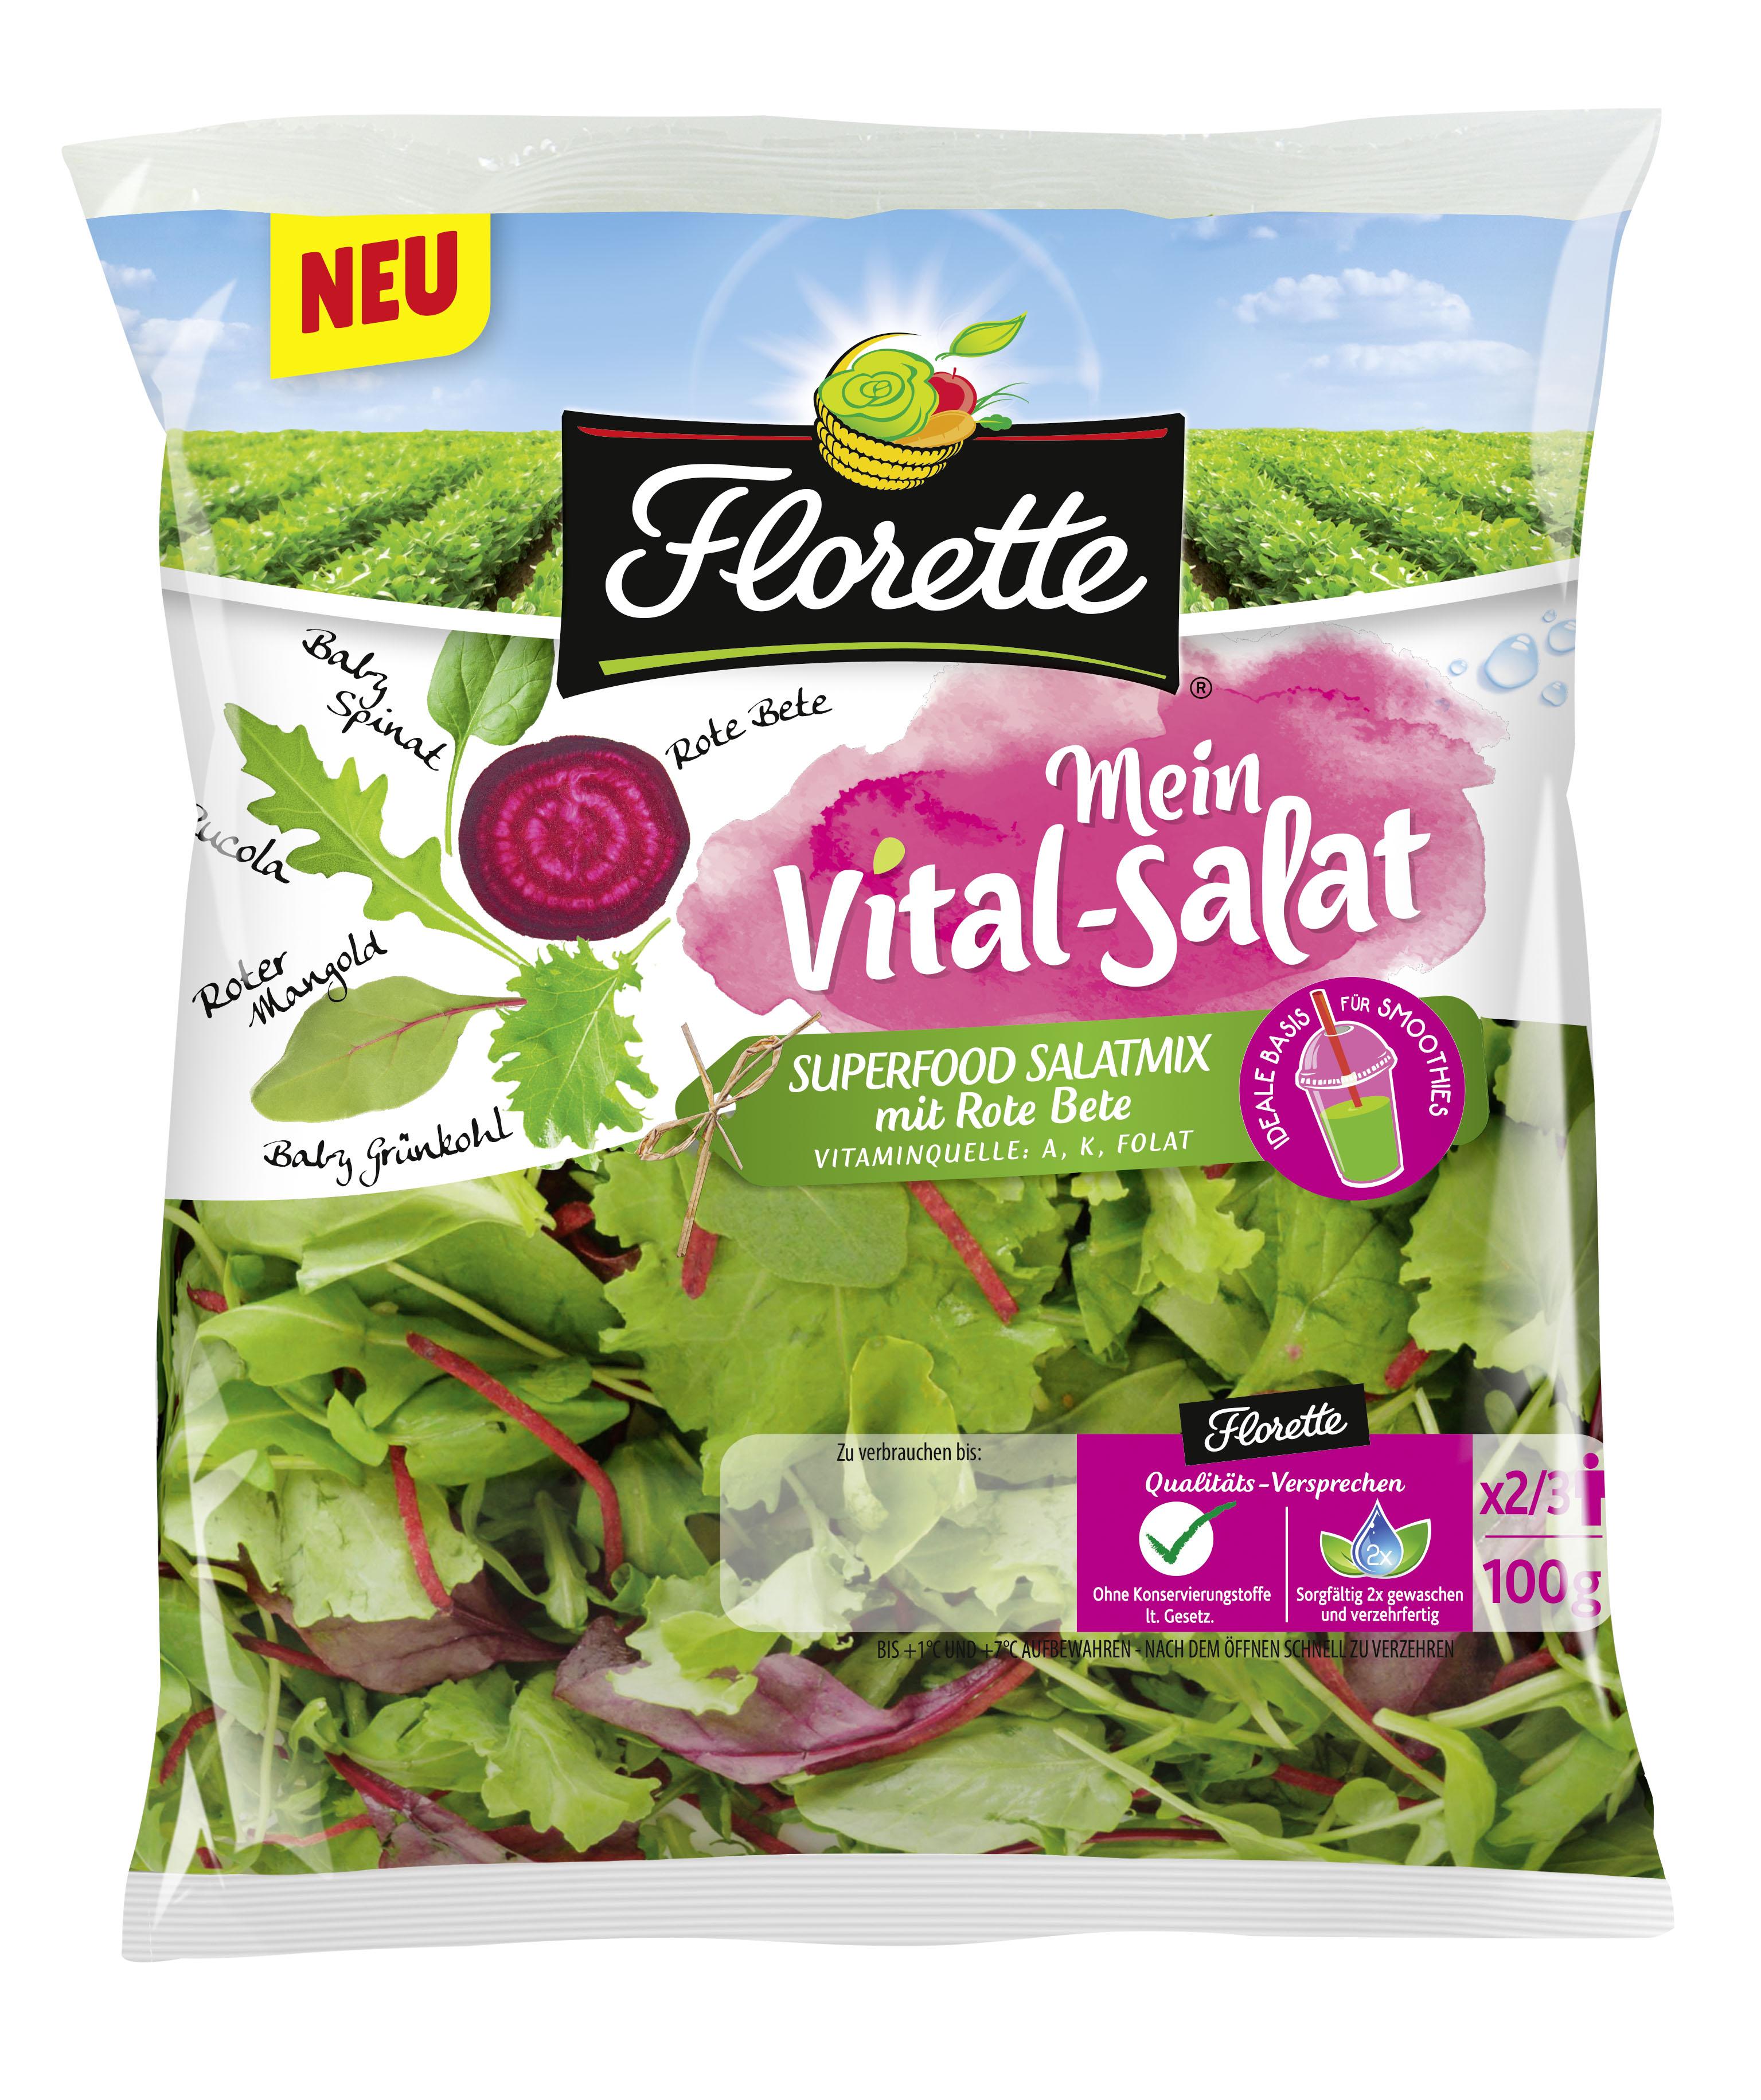 Florette Mein Vital-Salat Superfood Salatmix mit Roter Bete